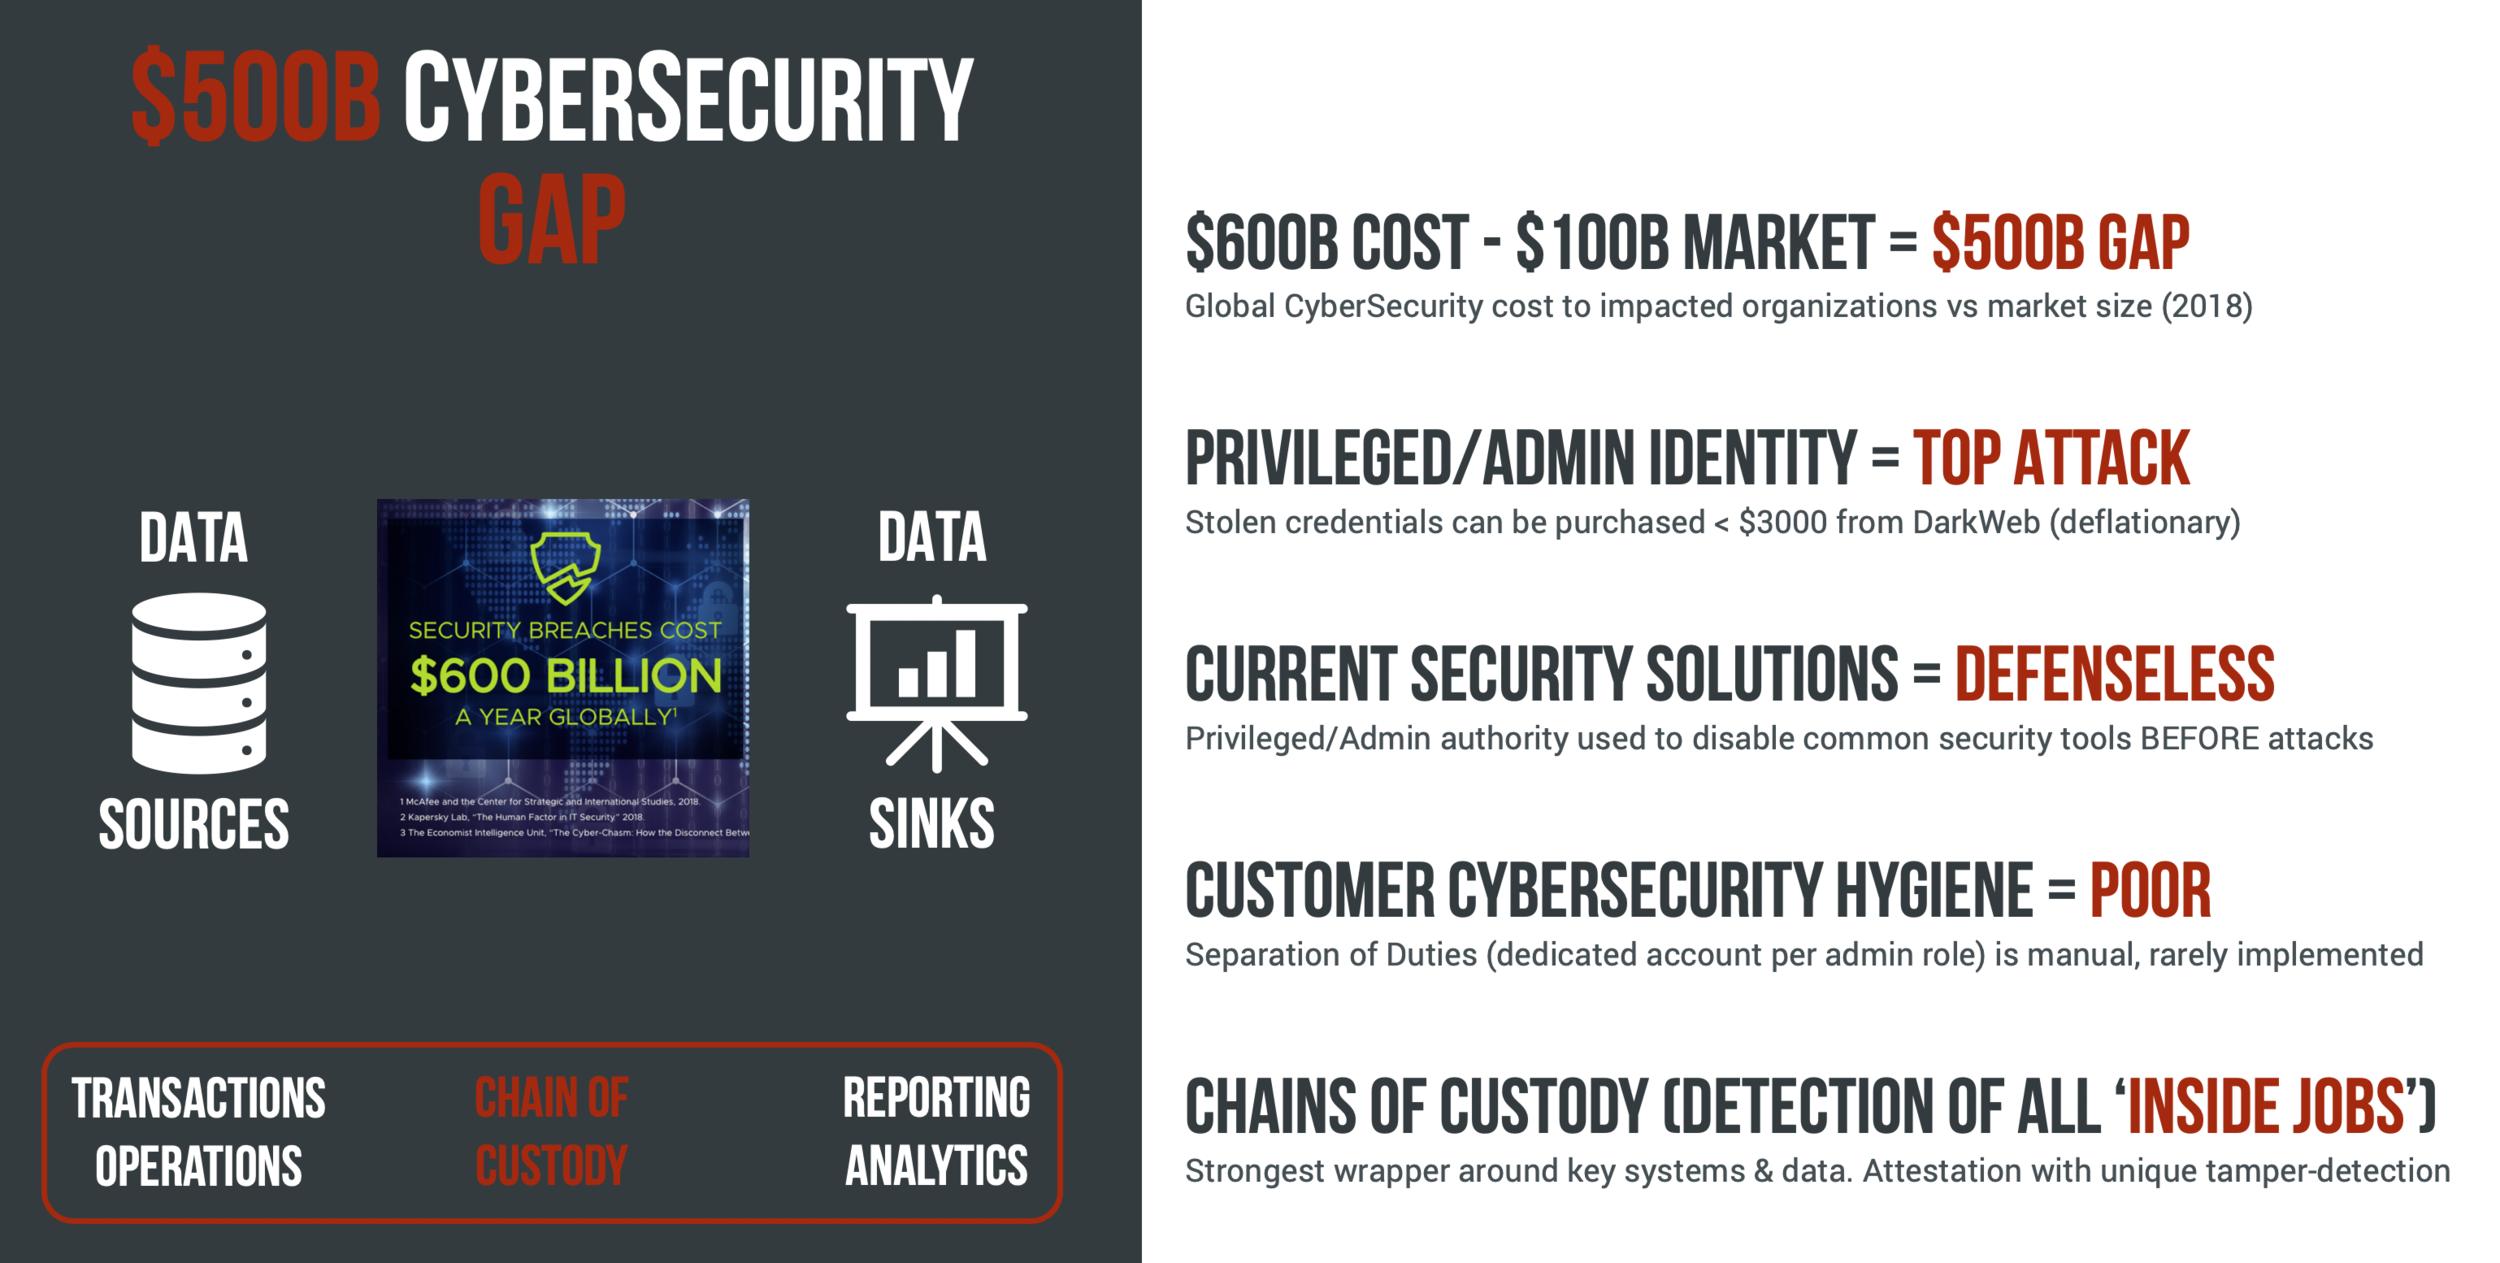 $500B CyberSecurity Gap.png